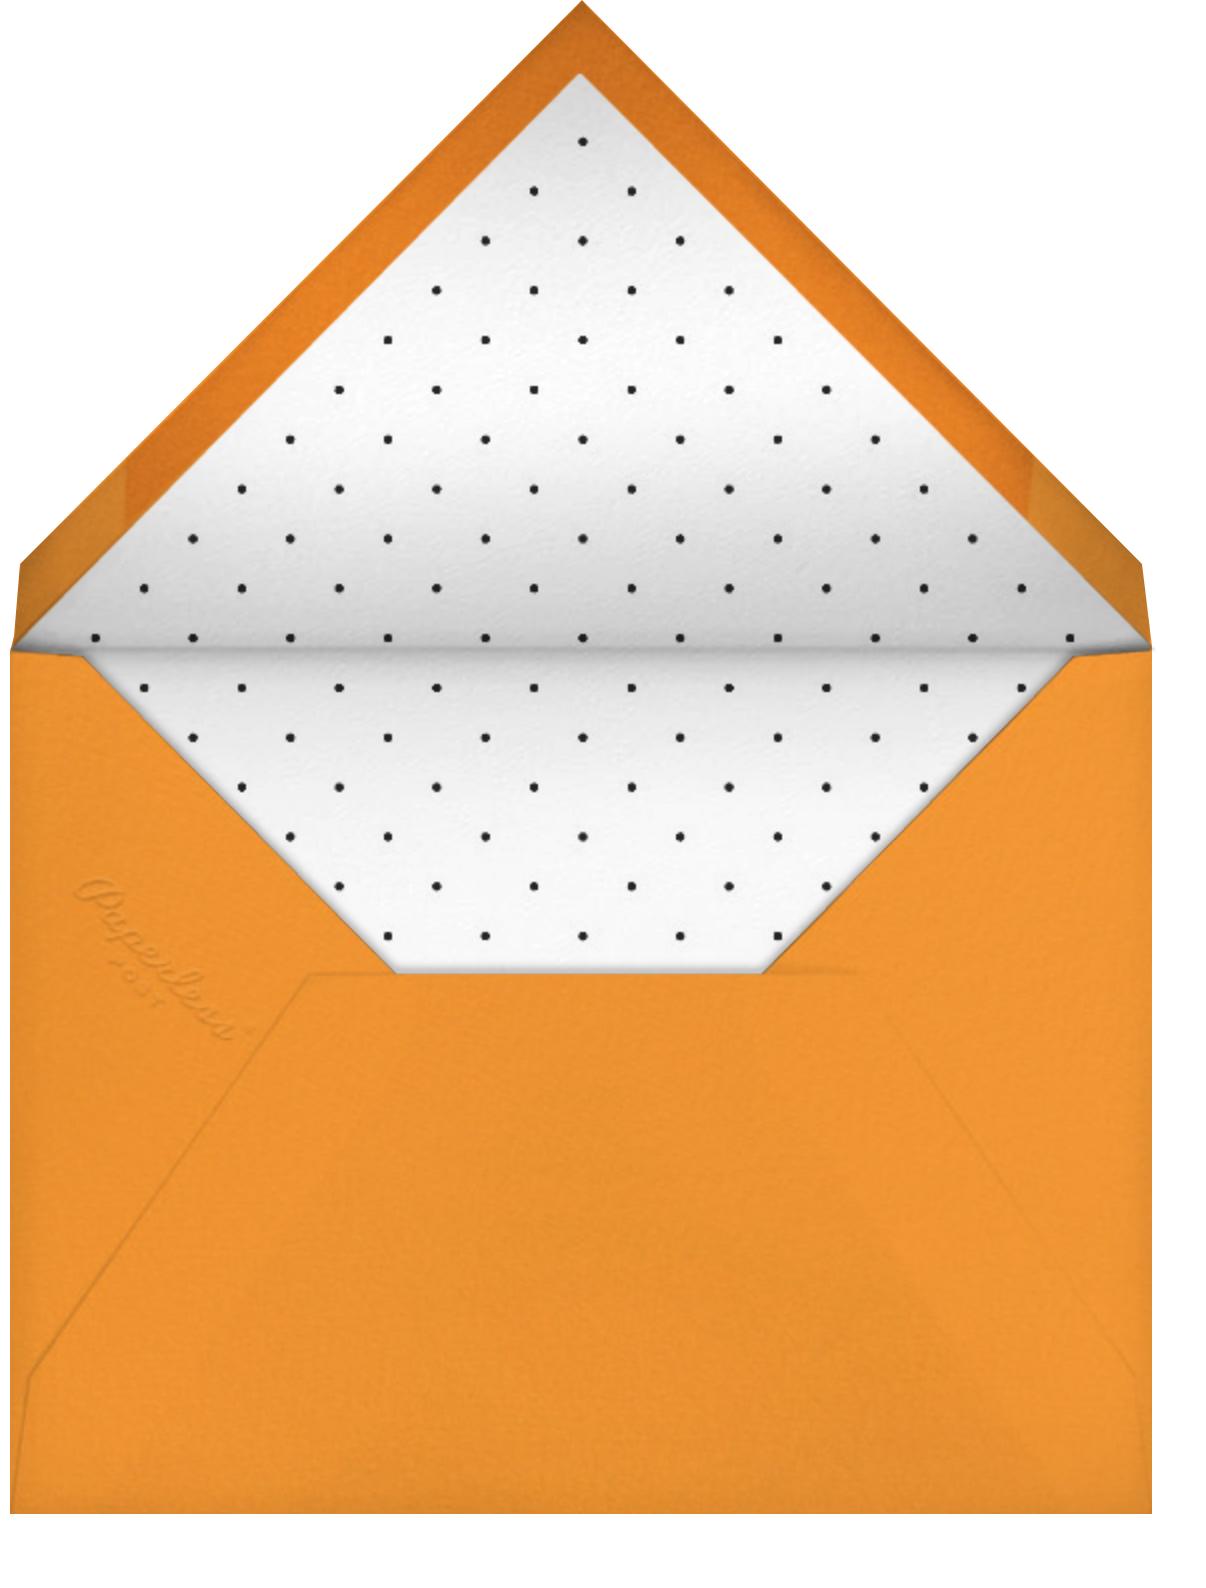 Shhhhhhh! - Orange - Mr. Boddington's Studio - Adult birthday - envelope back